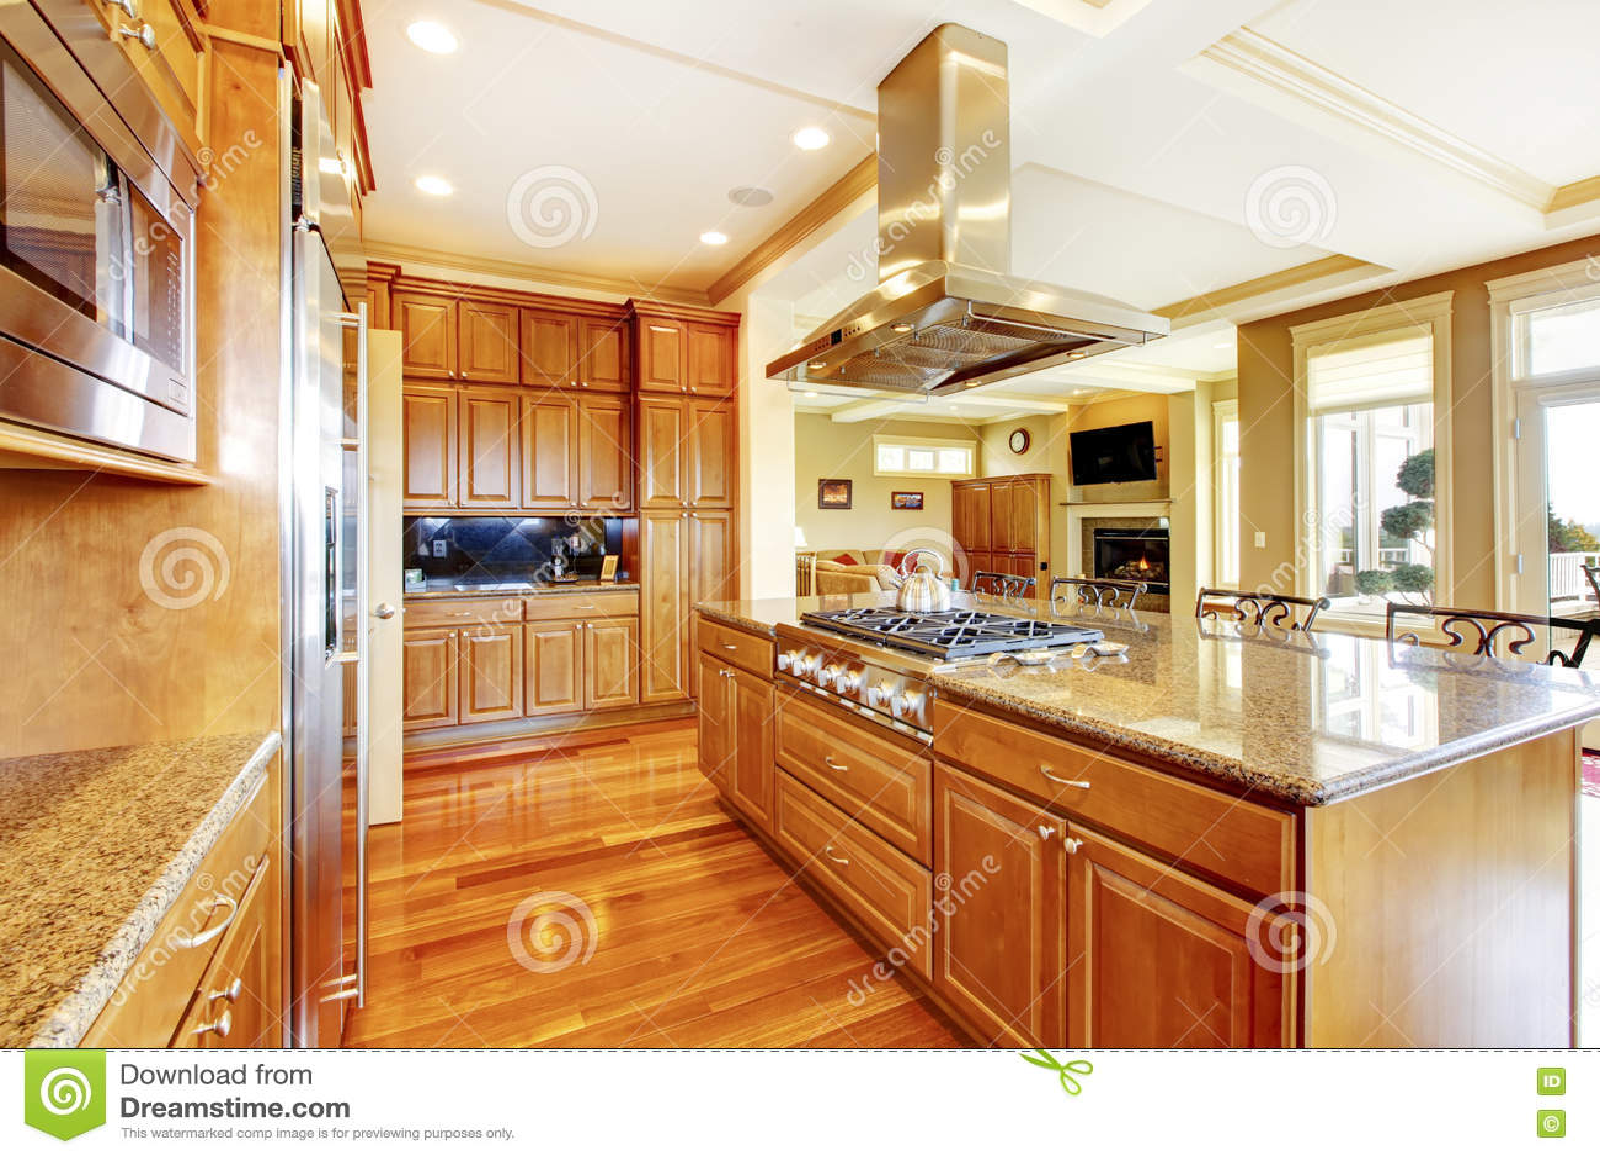 Modern Kitchen Island Royalty Free Stock Image